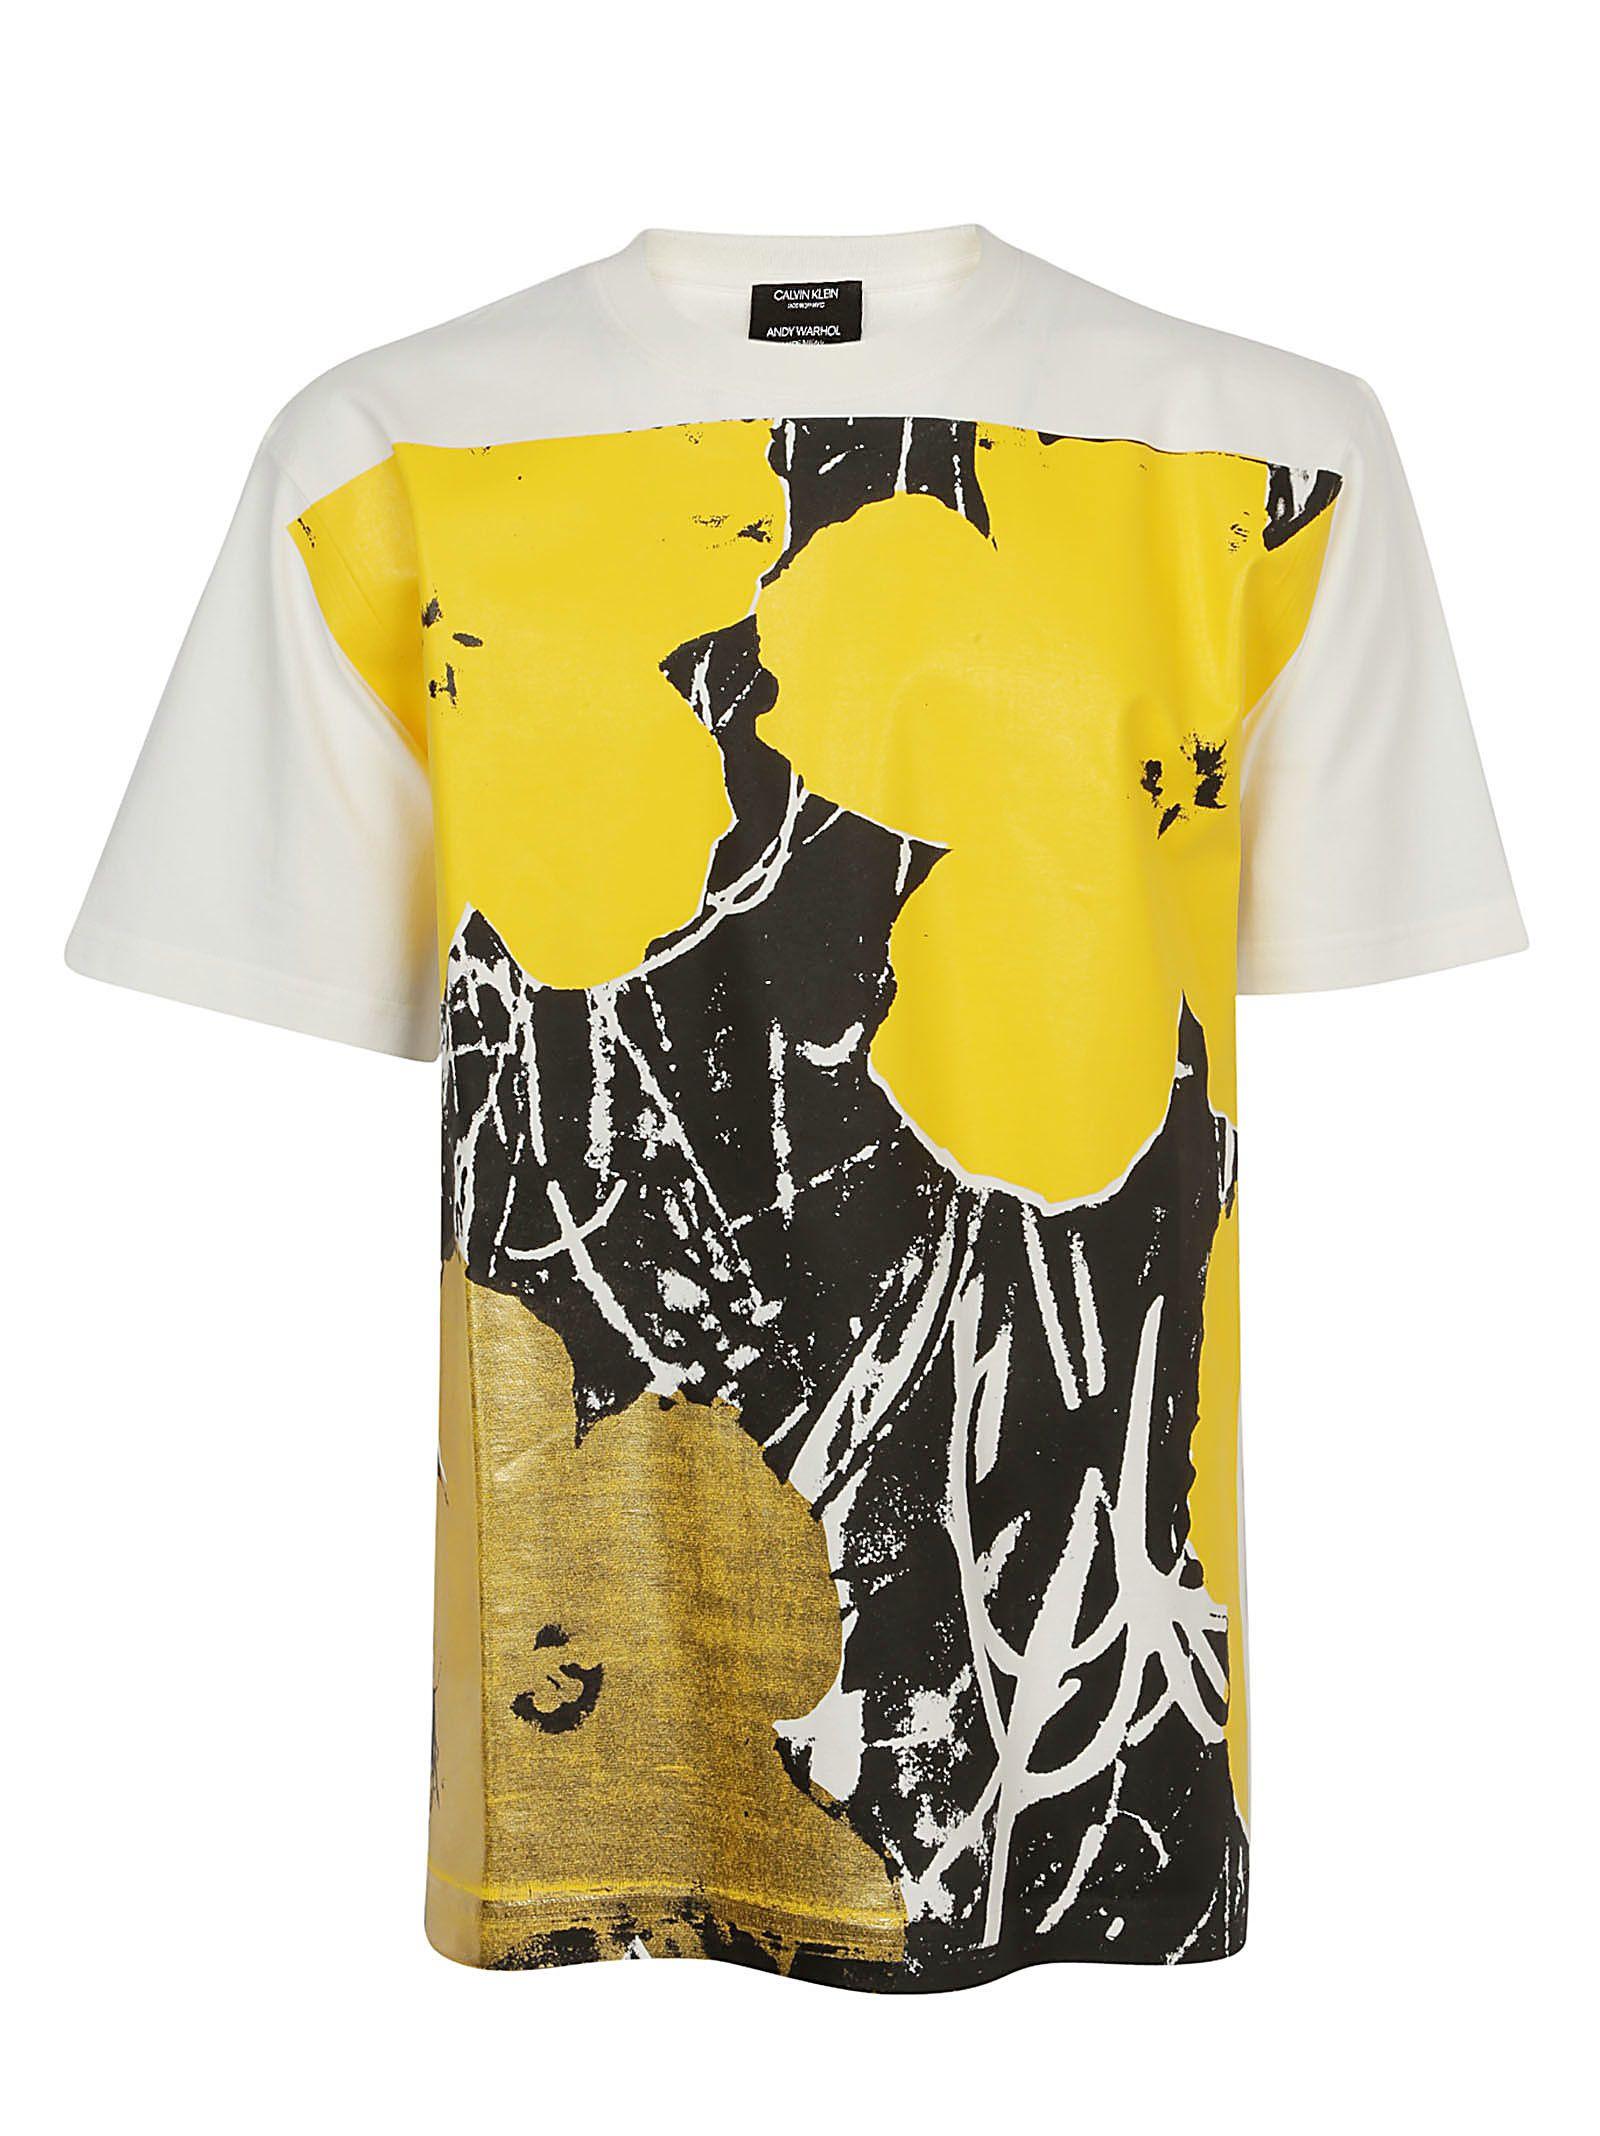 Calvin Klein 205w39nyc T-shirt